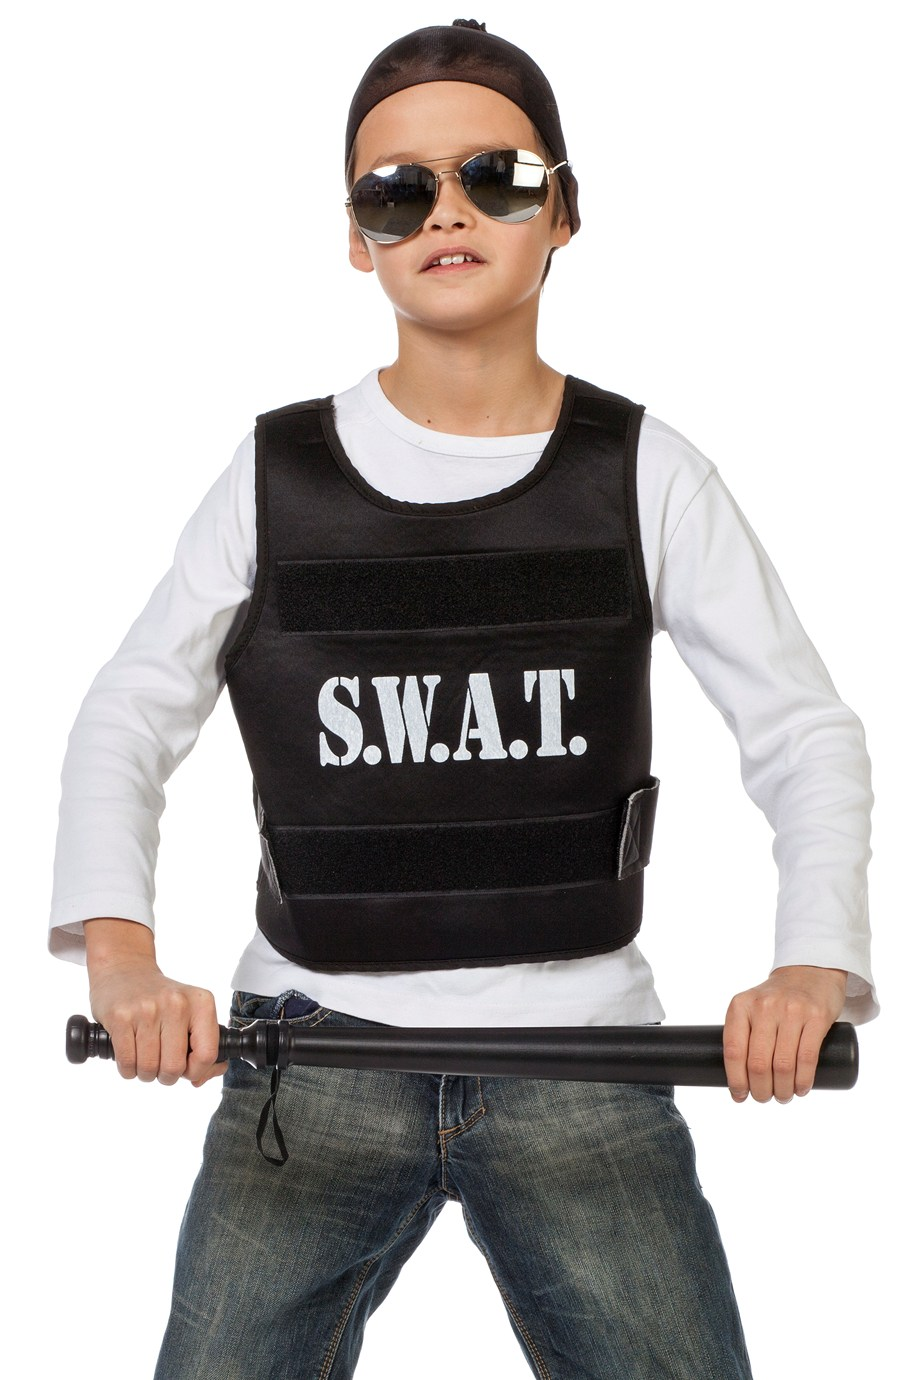 lasten poliisiasu